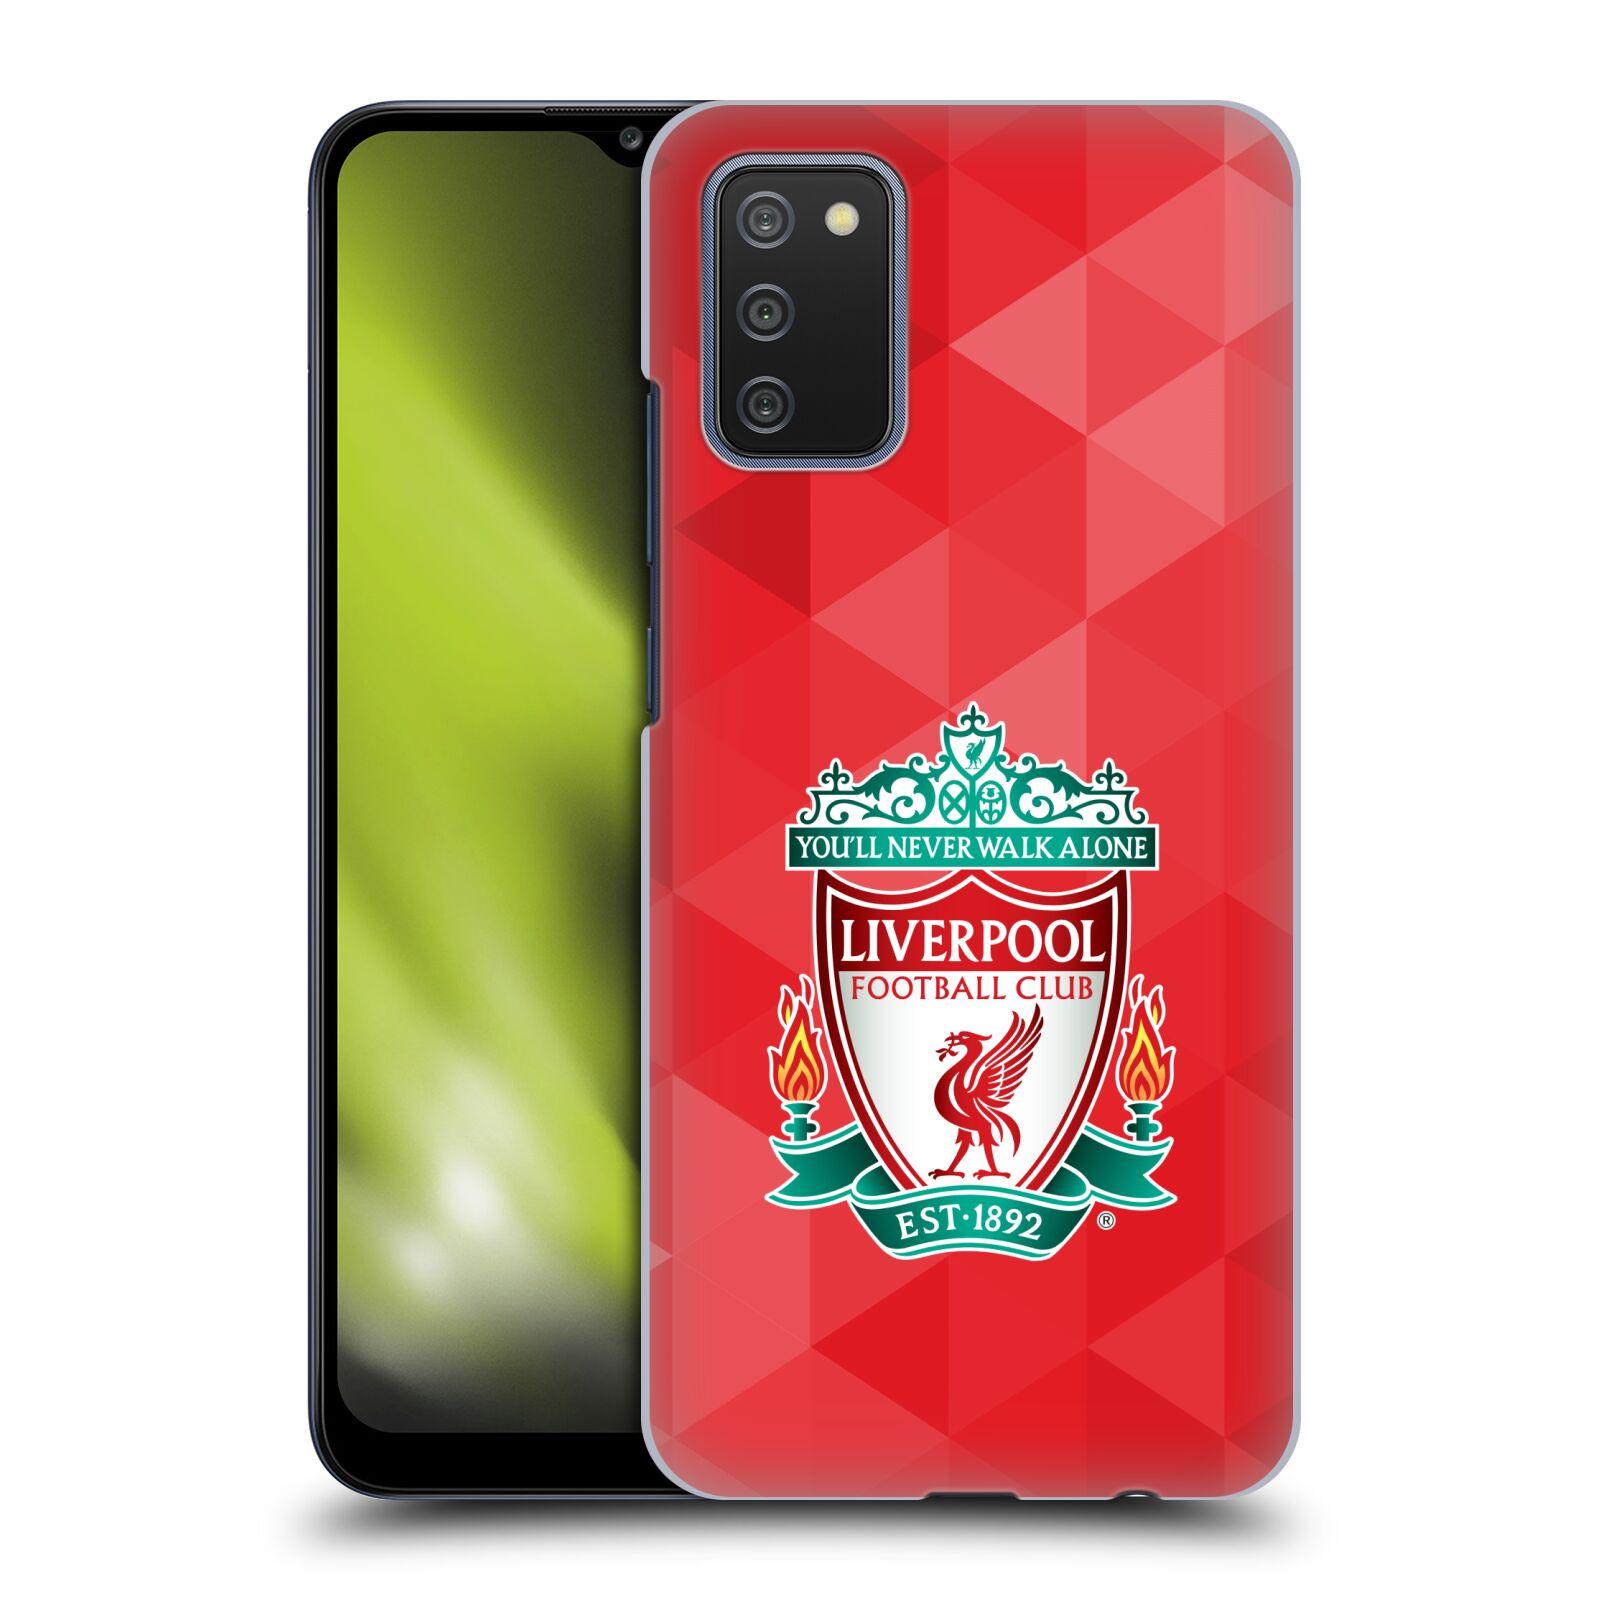 Plastové pouzdro na mobil Samsung Galaxy A02s - Head Case - ZNAK LIVERPOOL FC OFFICIAL GEOMETRIC RED